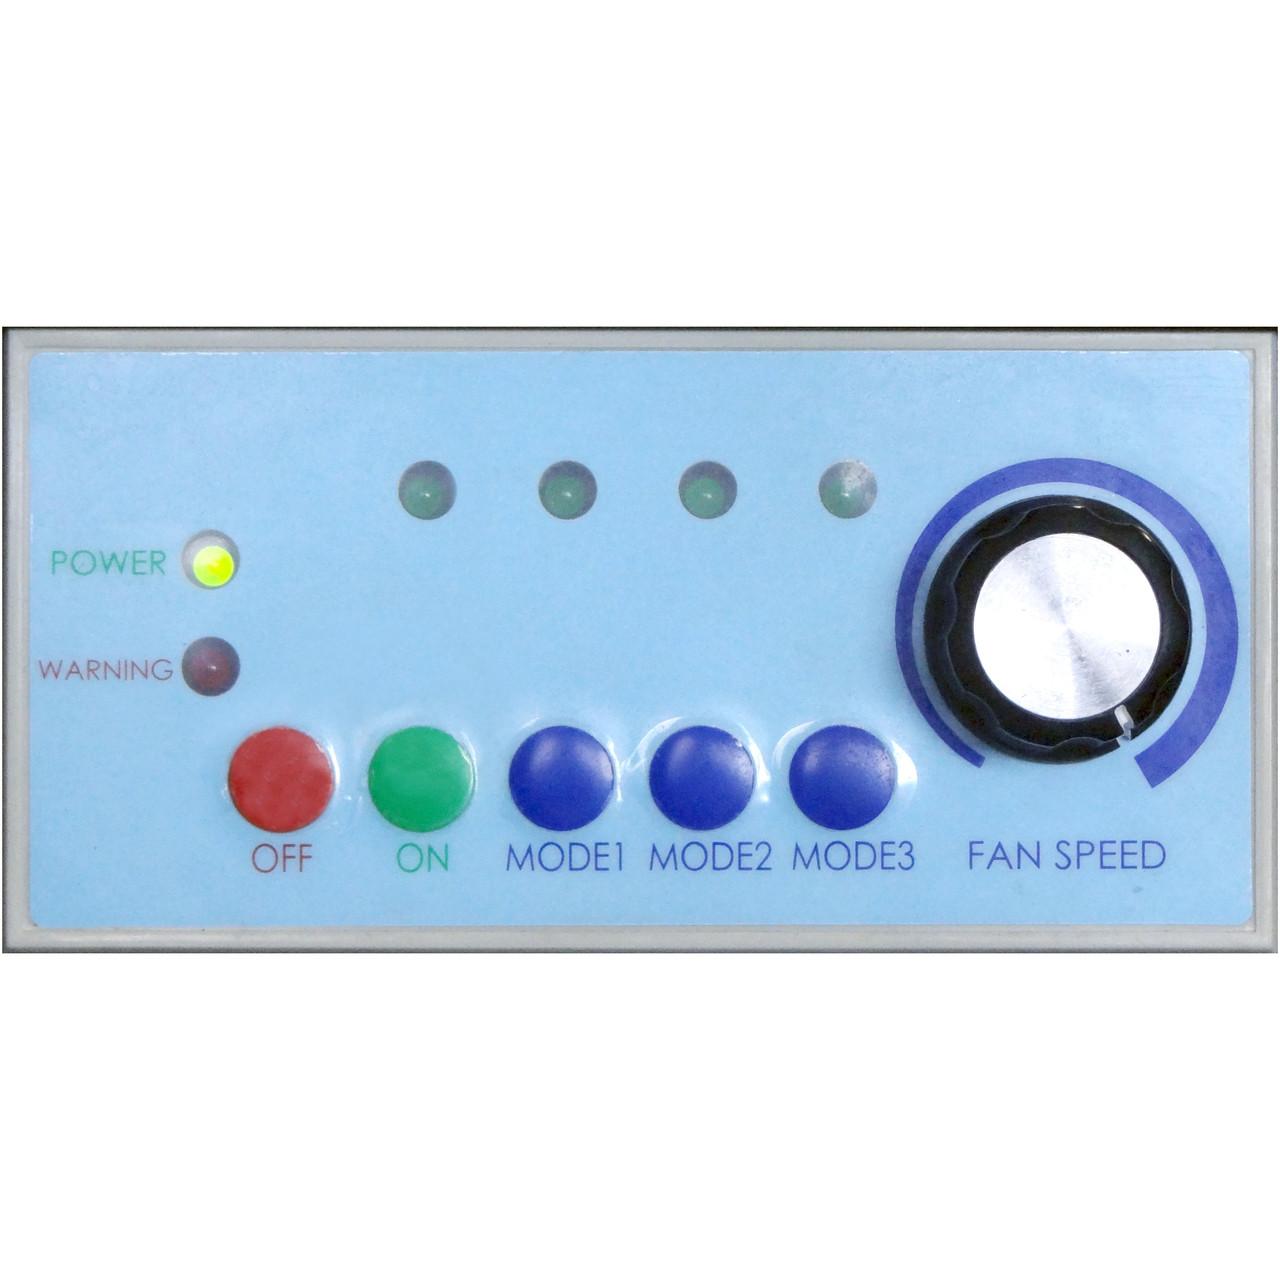 close-up of controls